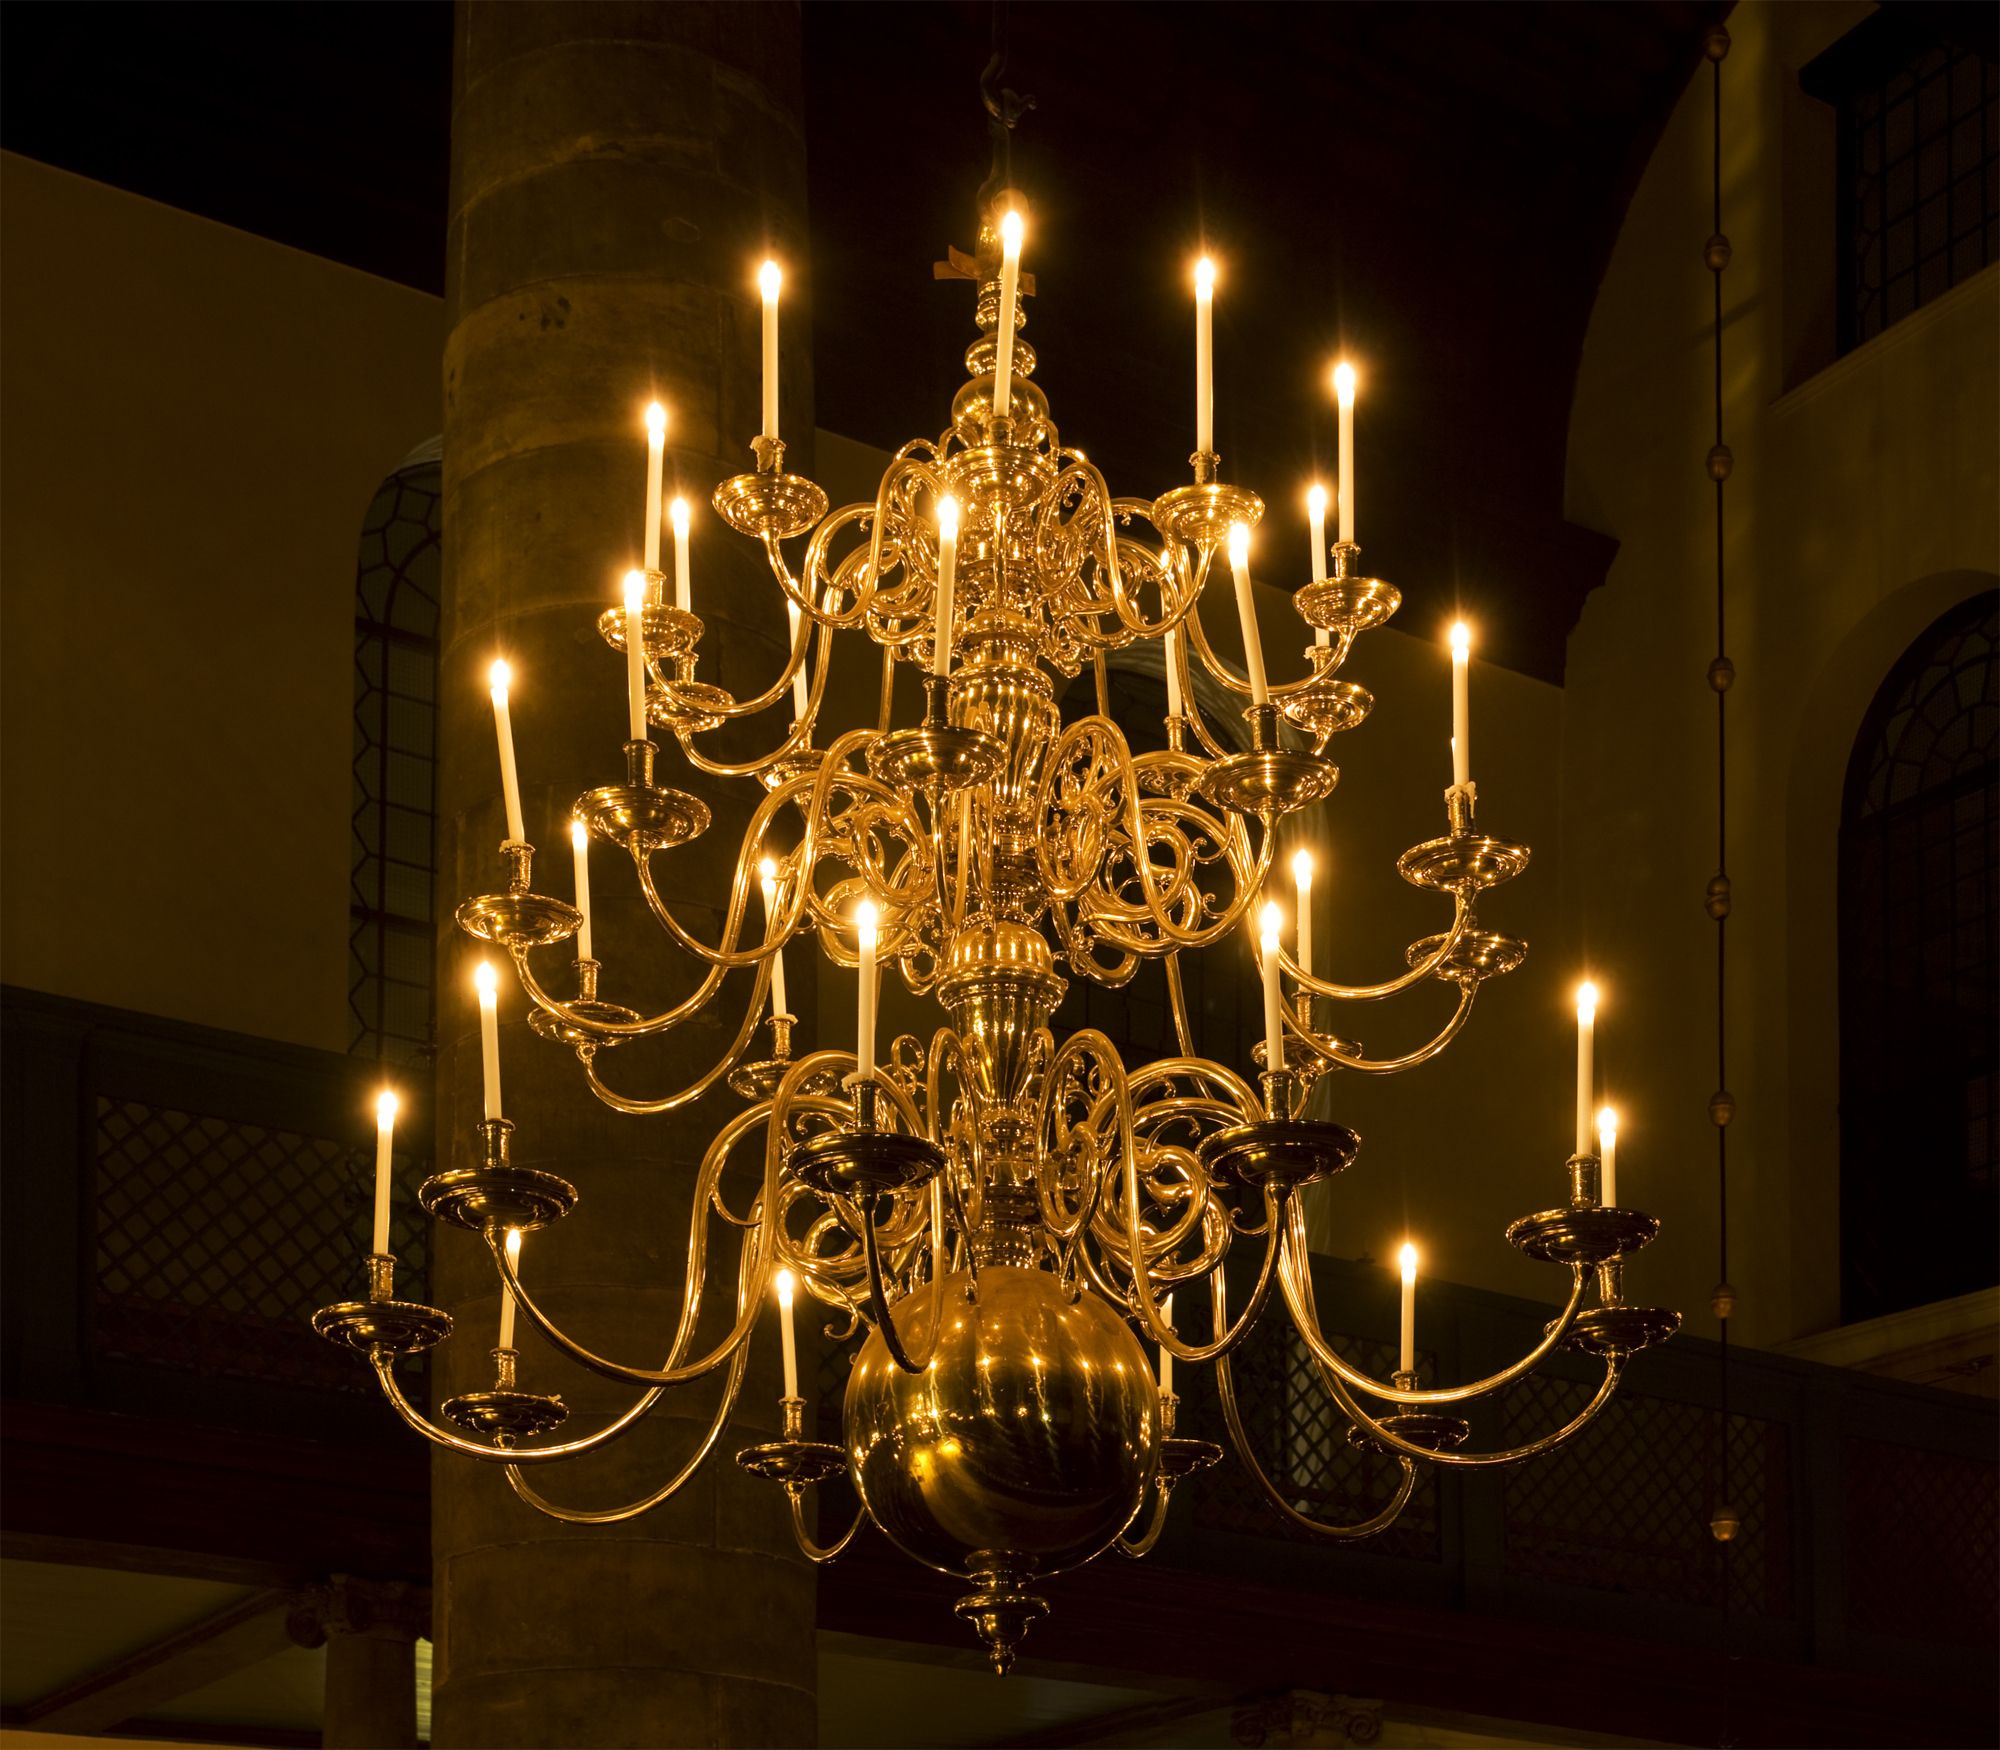 Chandelier chandelier pinterest chandeliers brass chandelier chandelier arubaitofo Image collections